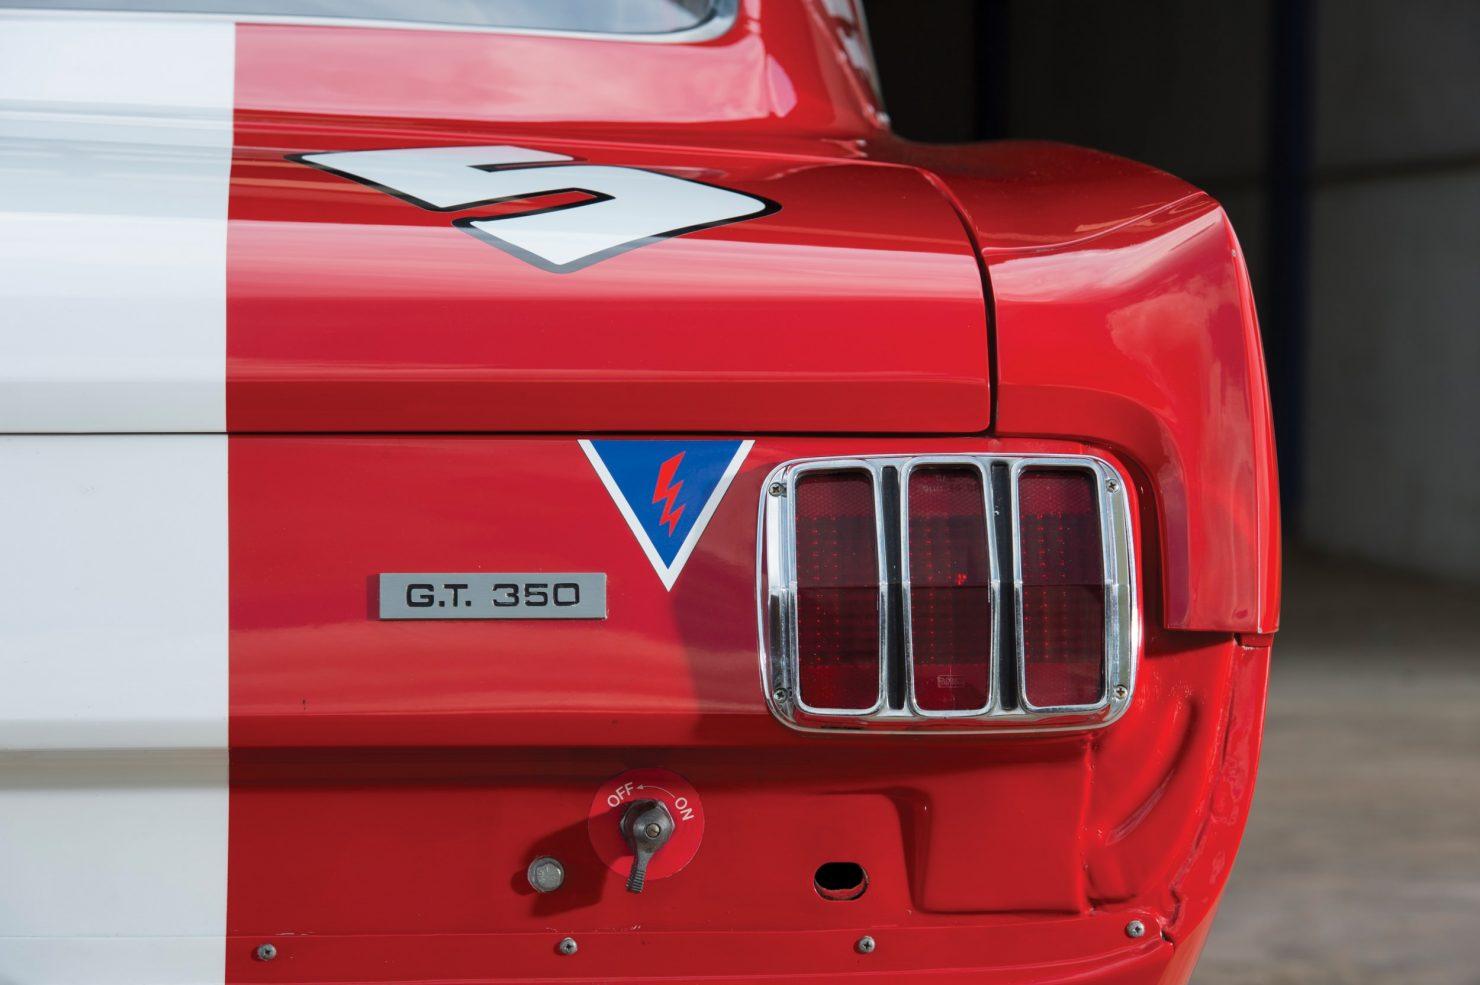 shelby gt350 race car 14 1480x985 - 1966 Shelby GT350 - Period SCCA Race Car